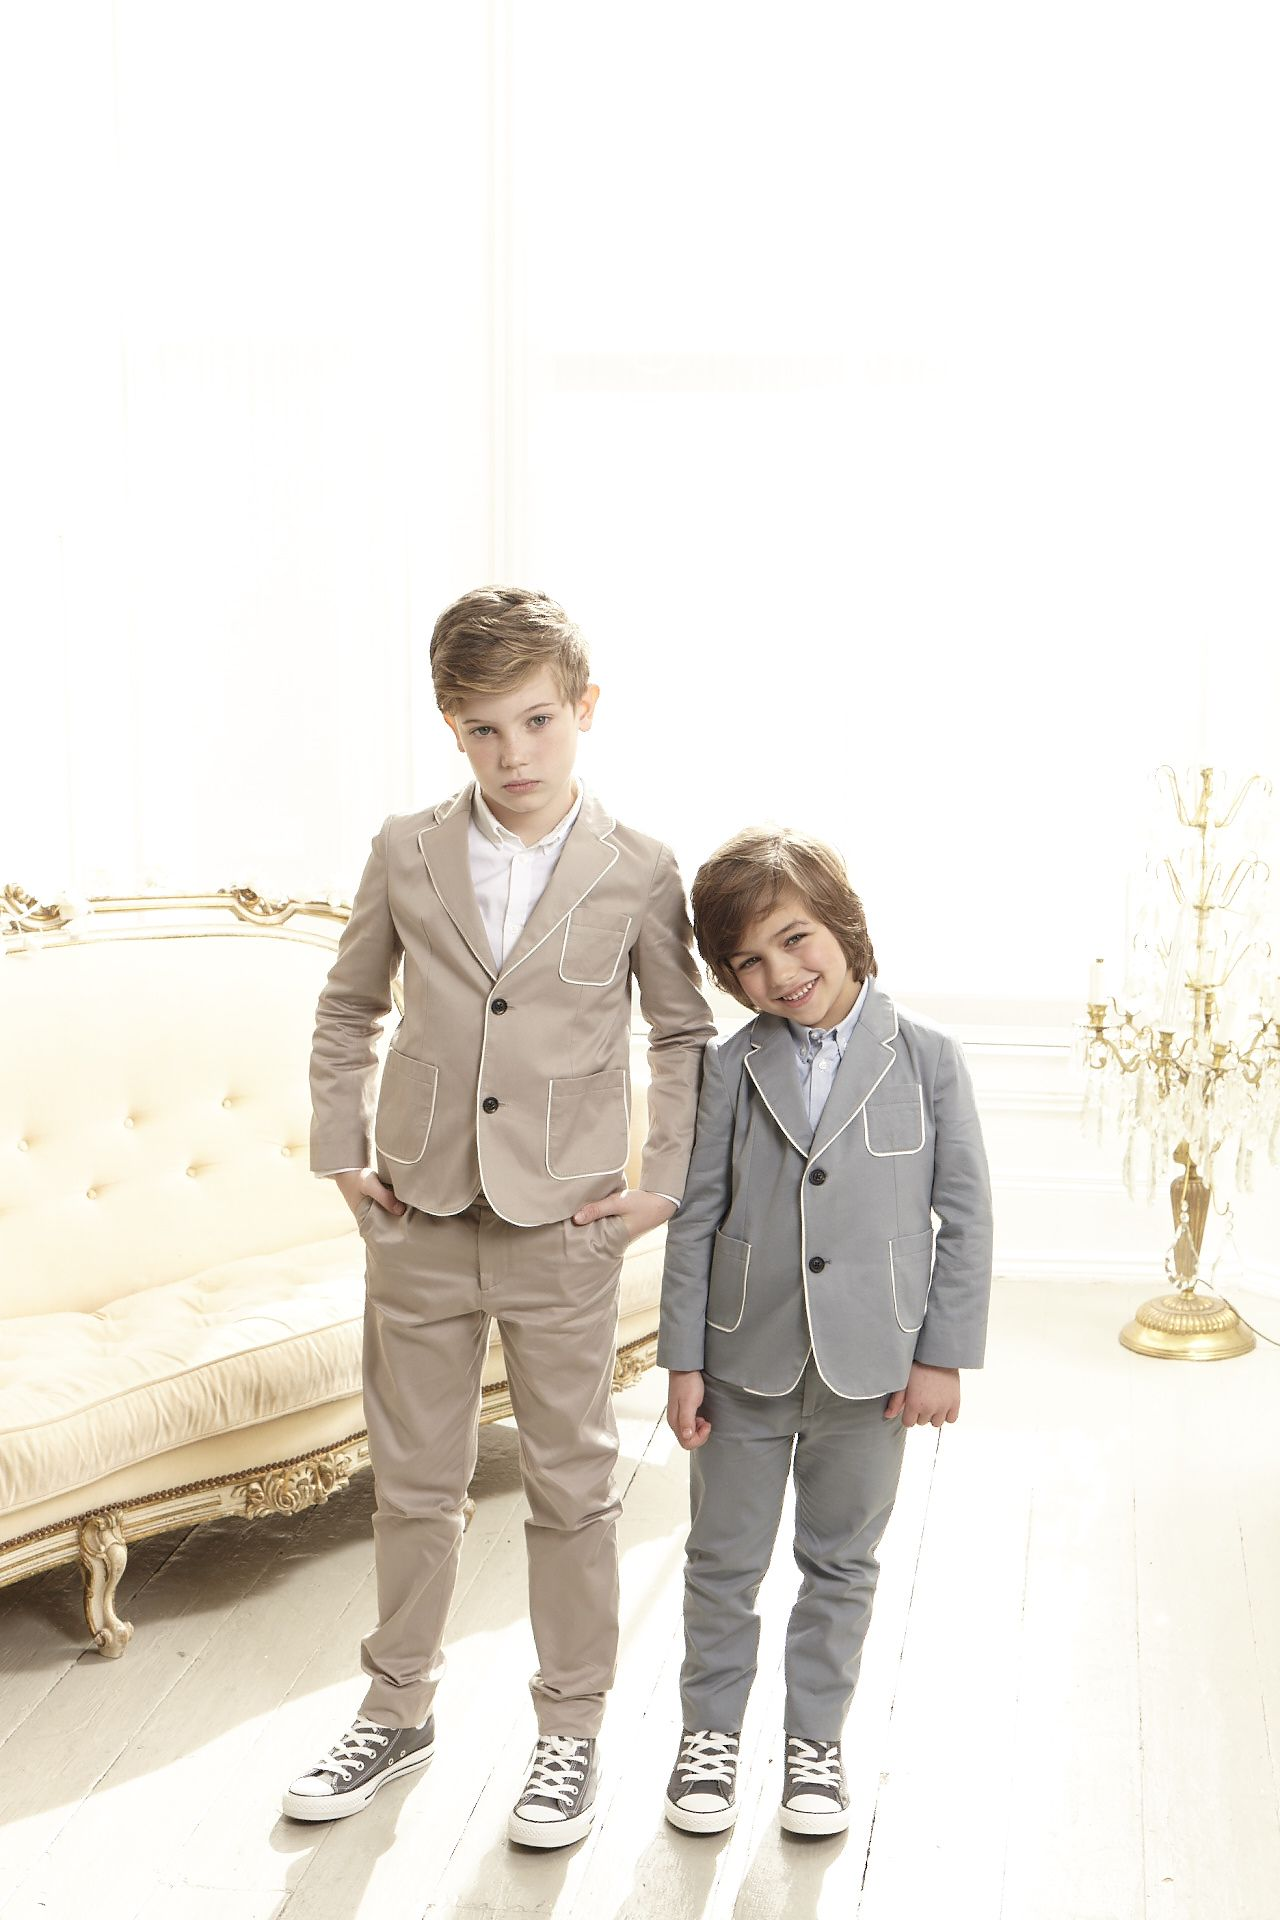 Boys outfits summer wedding - Google Search | Summer wedding | Pinterest | Boys